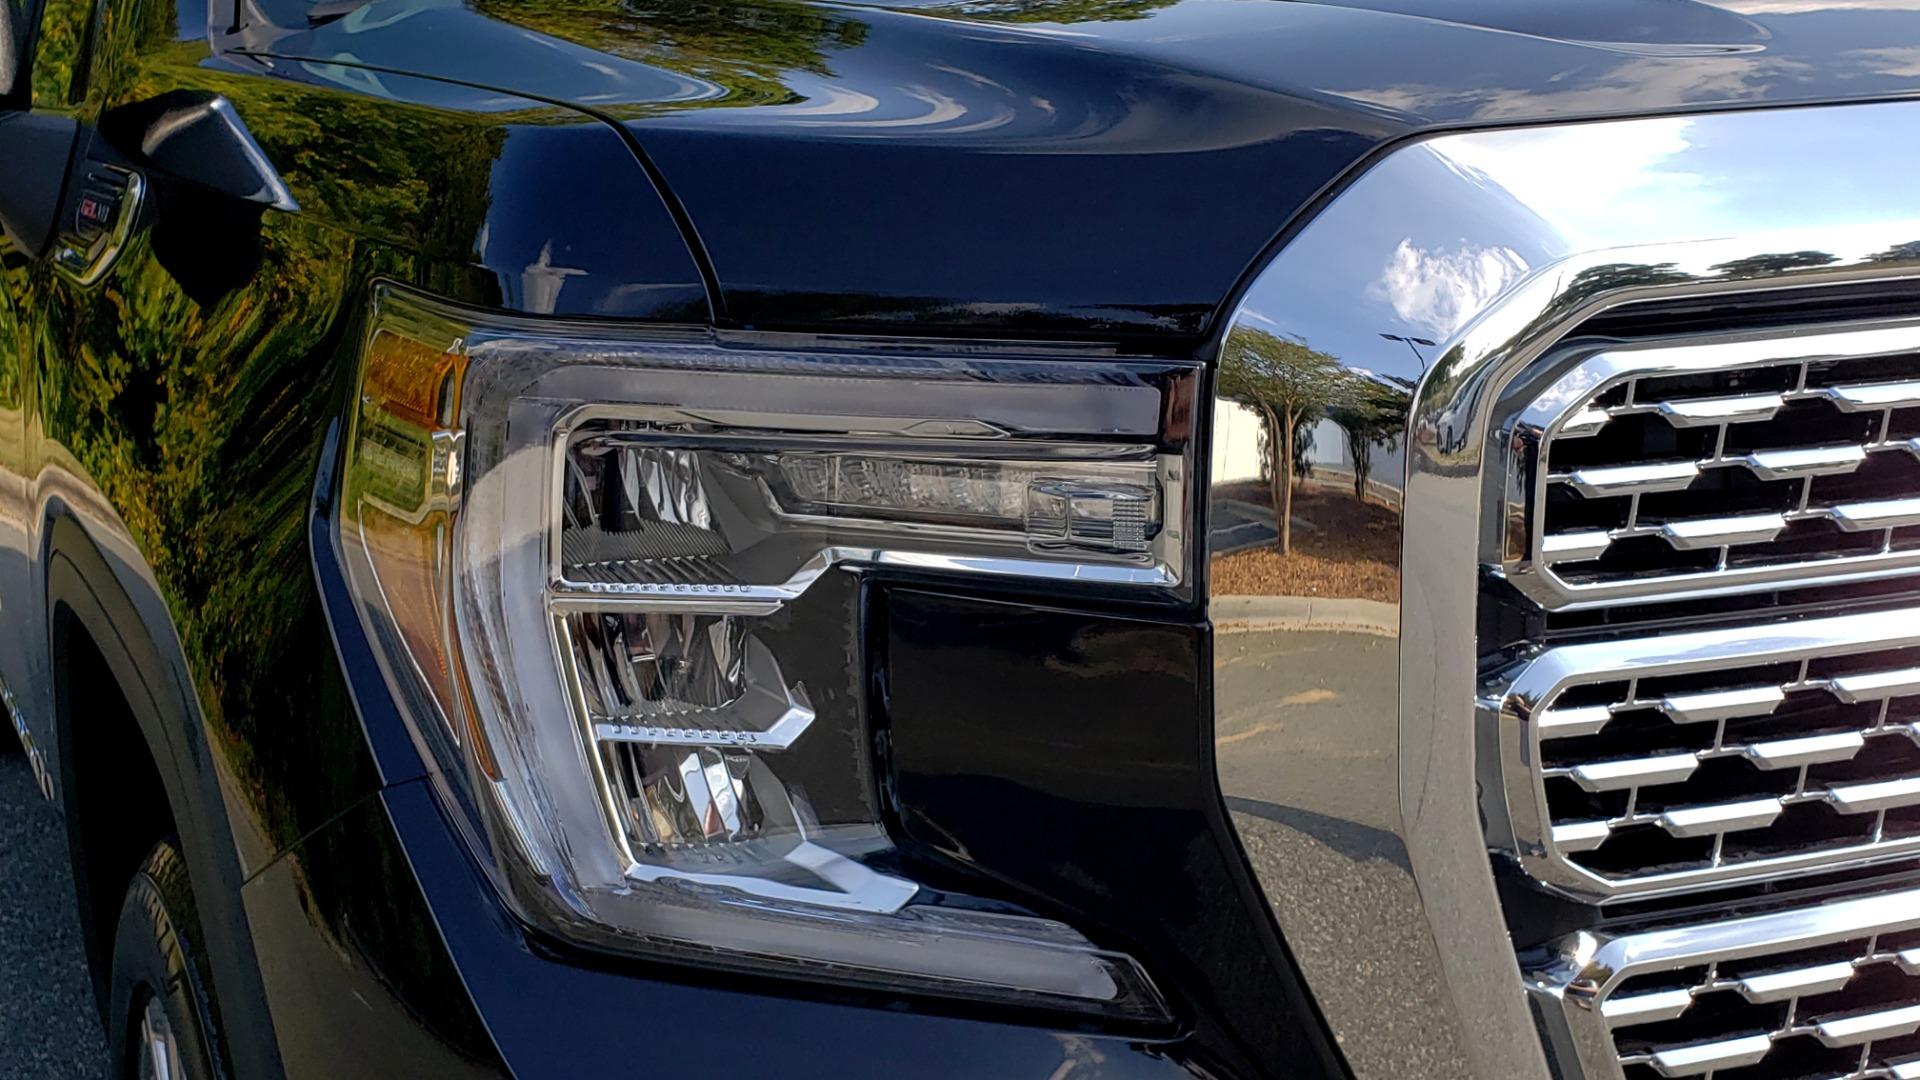 Used 2019 GMC SIERRA 1500 DENALI ULTIMATE 4WD / NAV / TECH PKG / DRVR ALRT for sale Sold at Formula Imports in Charlotte NC 28227 29